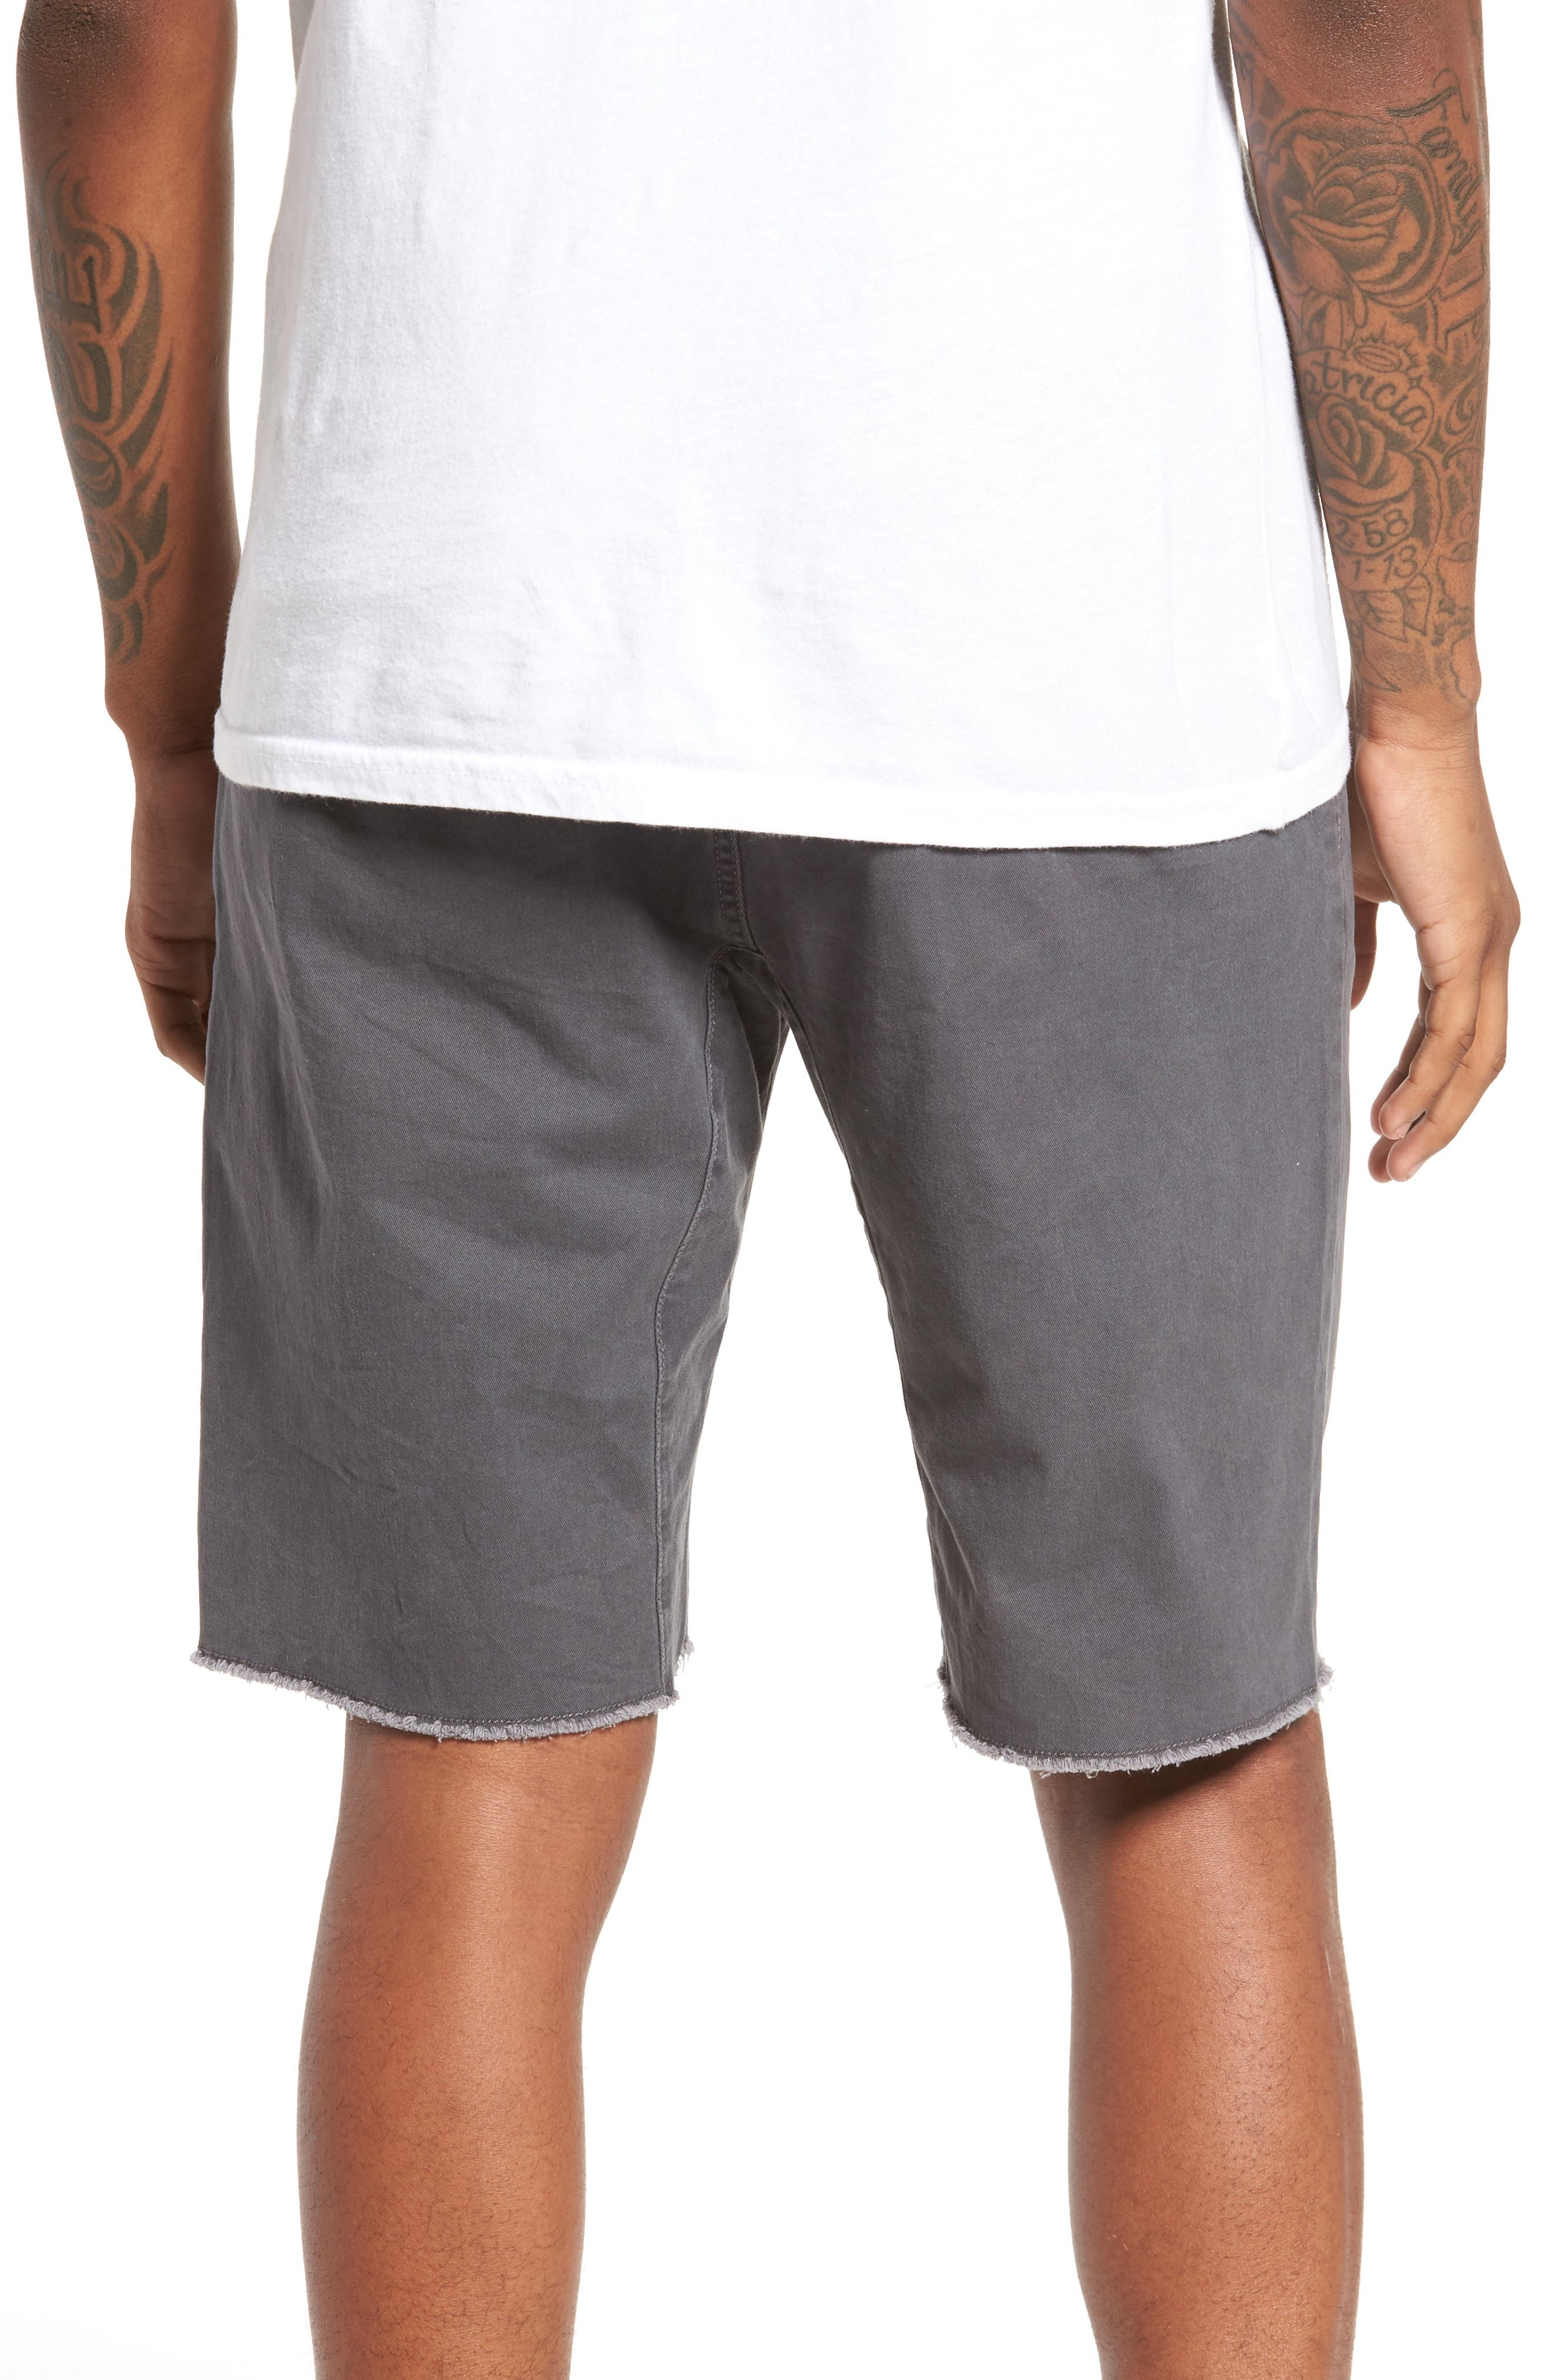 Jogger Shorts,                             Alternate thumbnail 2, color,                             GREY ONYX